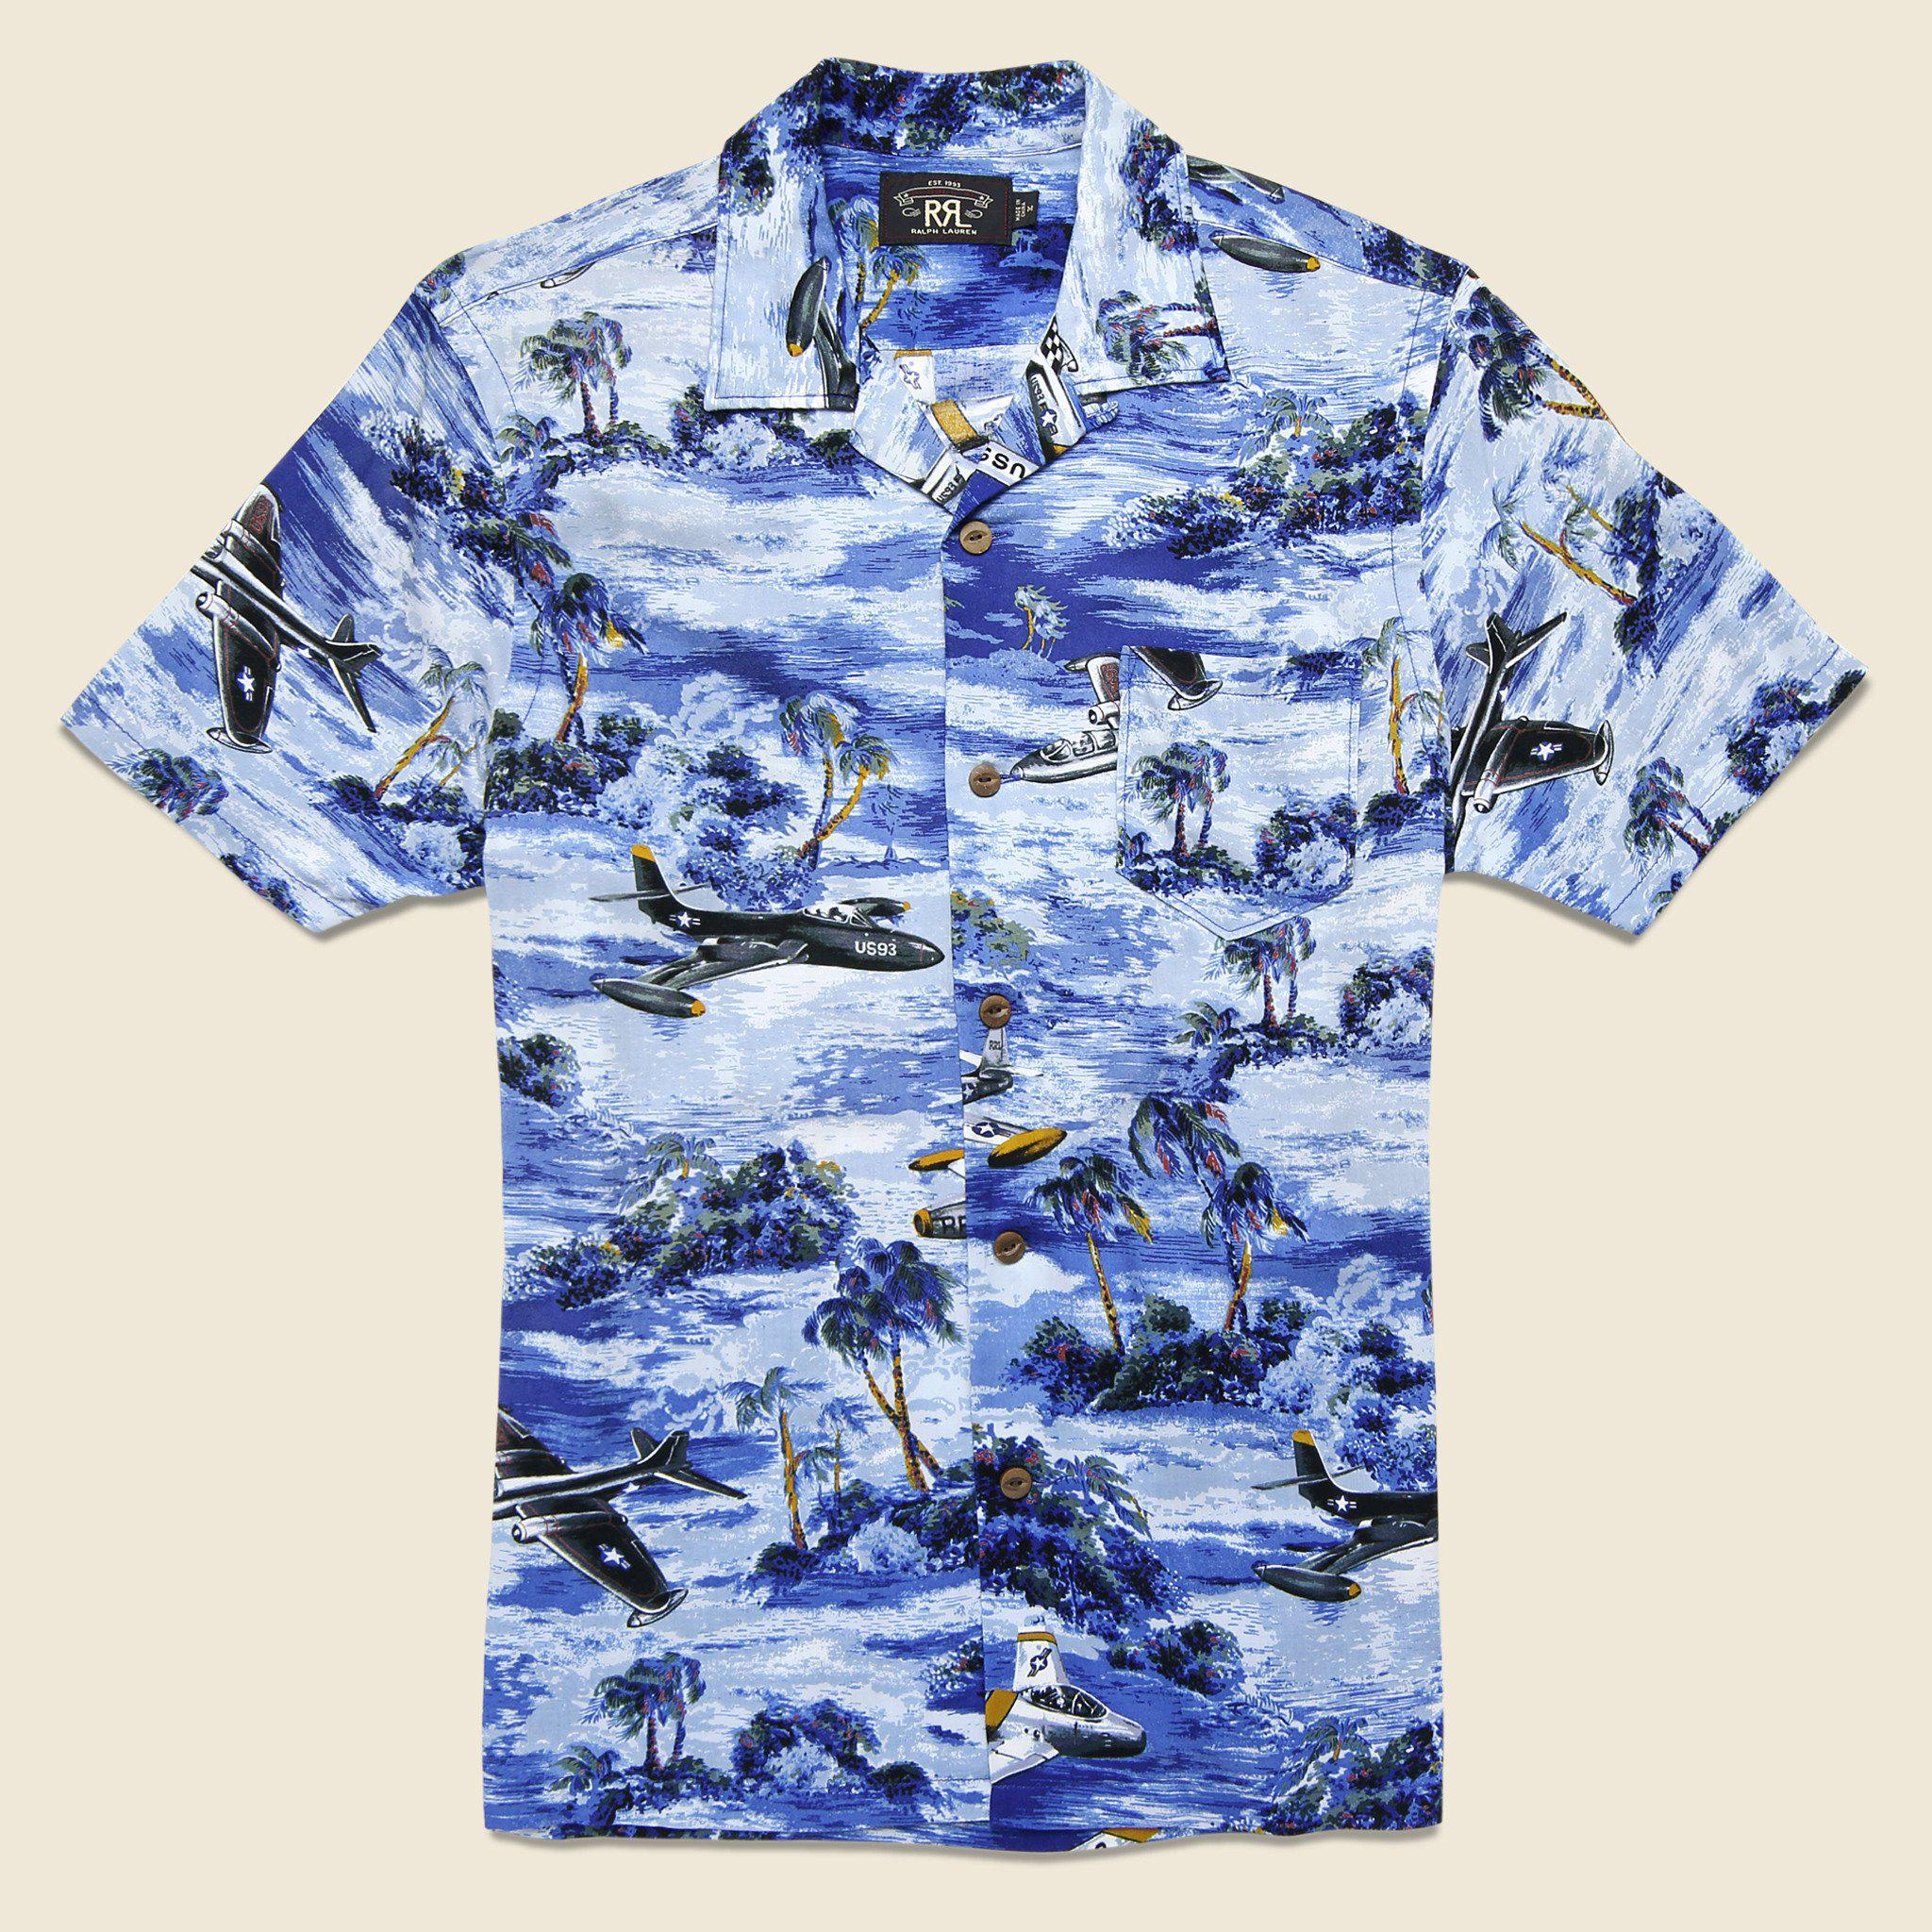 14880411 RRL Military Print Aloha Camp Shirt - Blue Multi in Blue for Men - Lyst